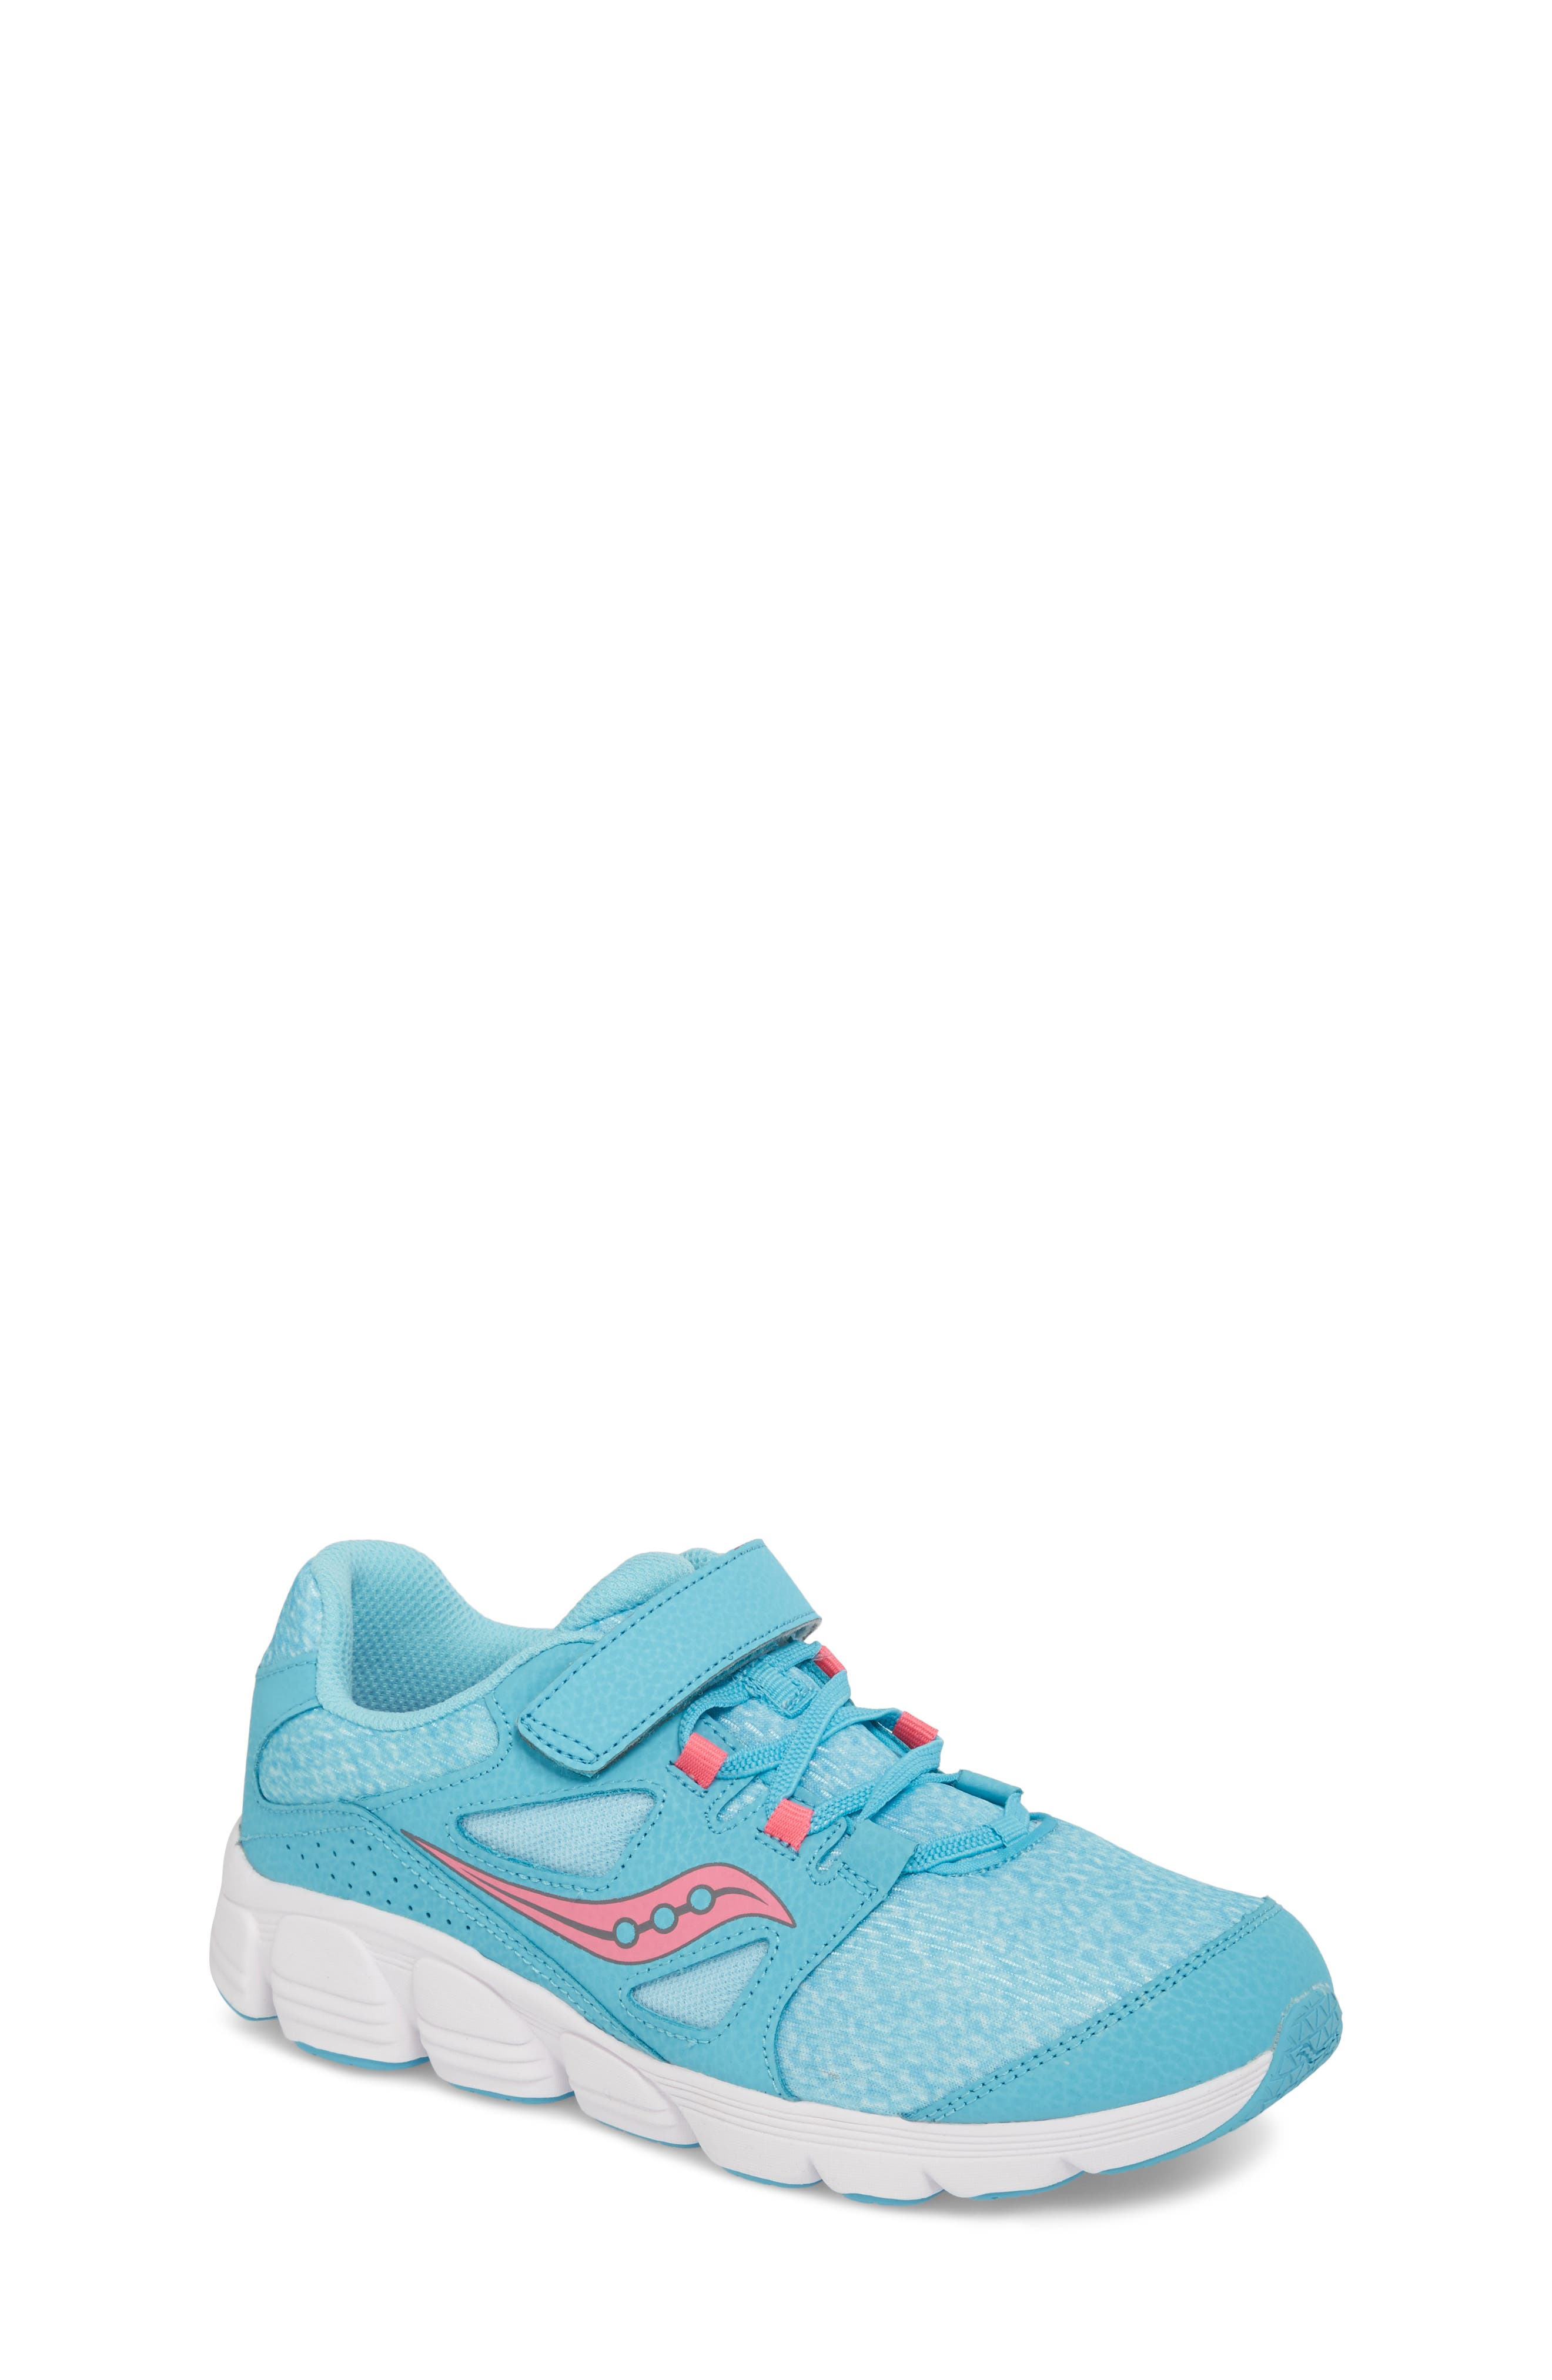 Kotaro 4 Sneaker,                         Main,                         color, Turquoise/ Pink